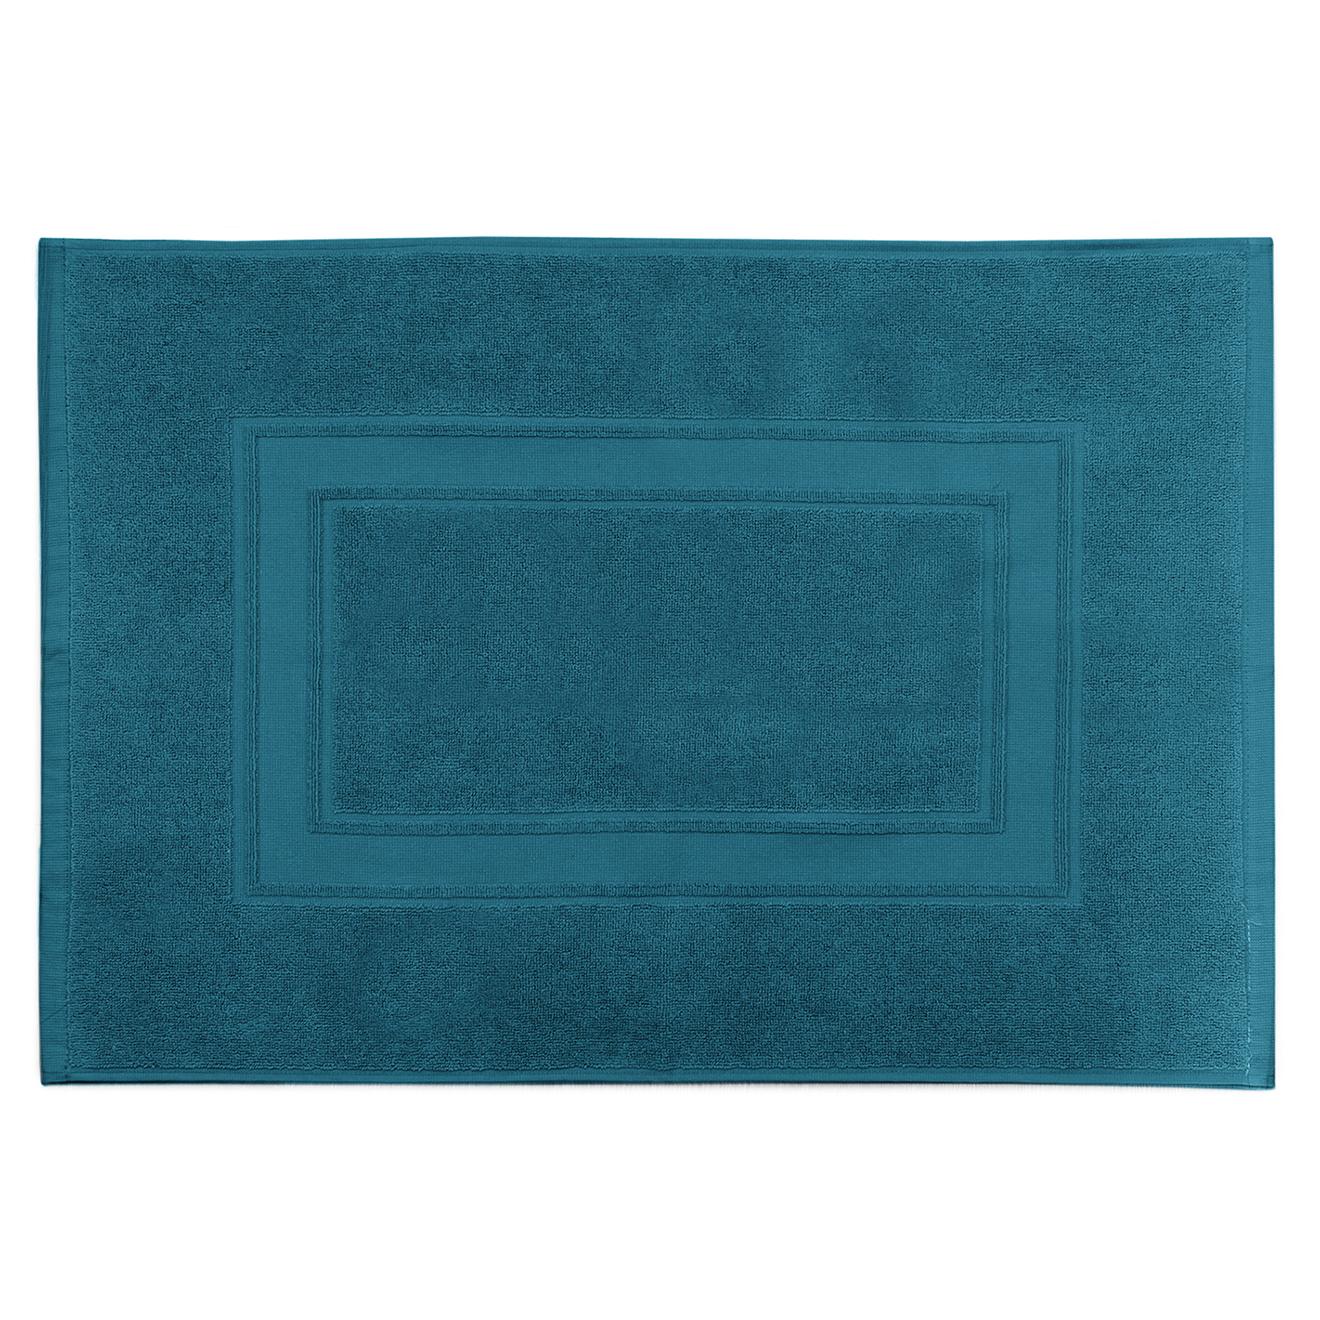 Tapis de bain Elisa turquoise - 50x70 cm